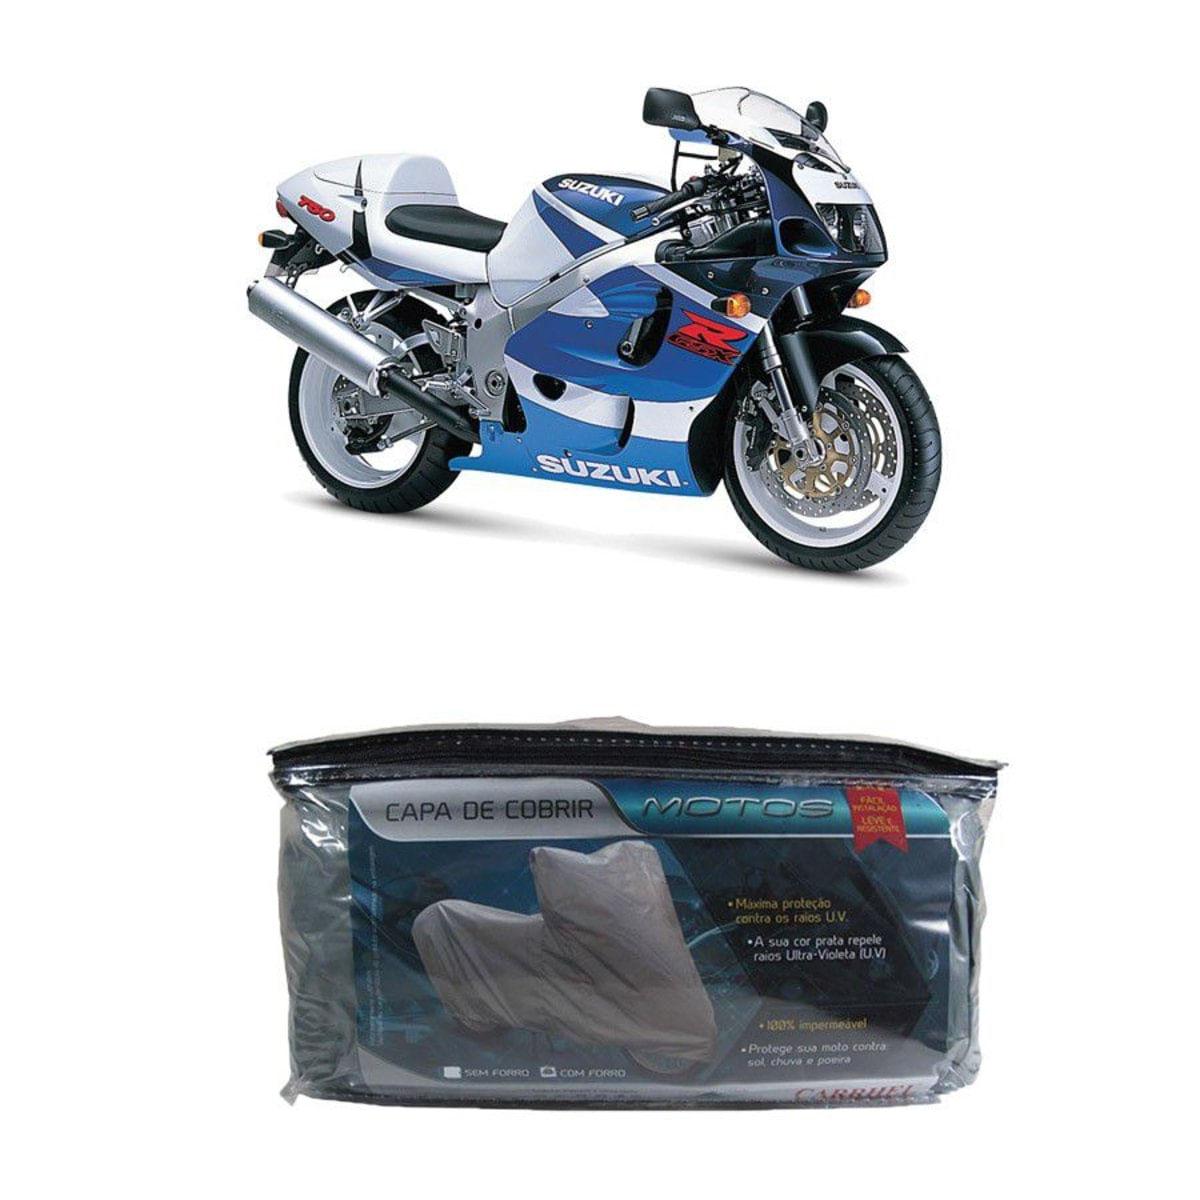 Capa Para Cobrir Suzuki Gsx 750W Srad Com Forro G(203)